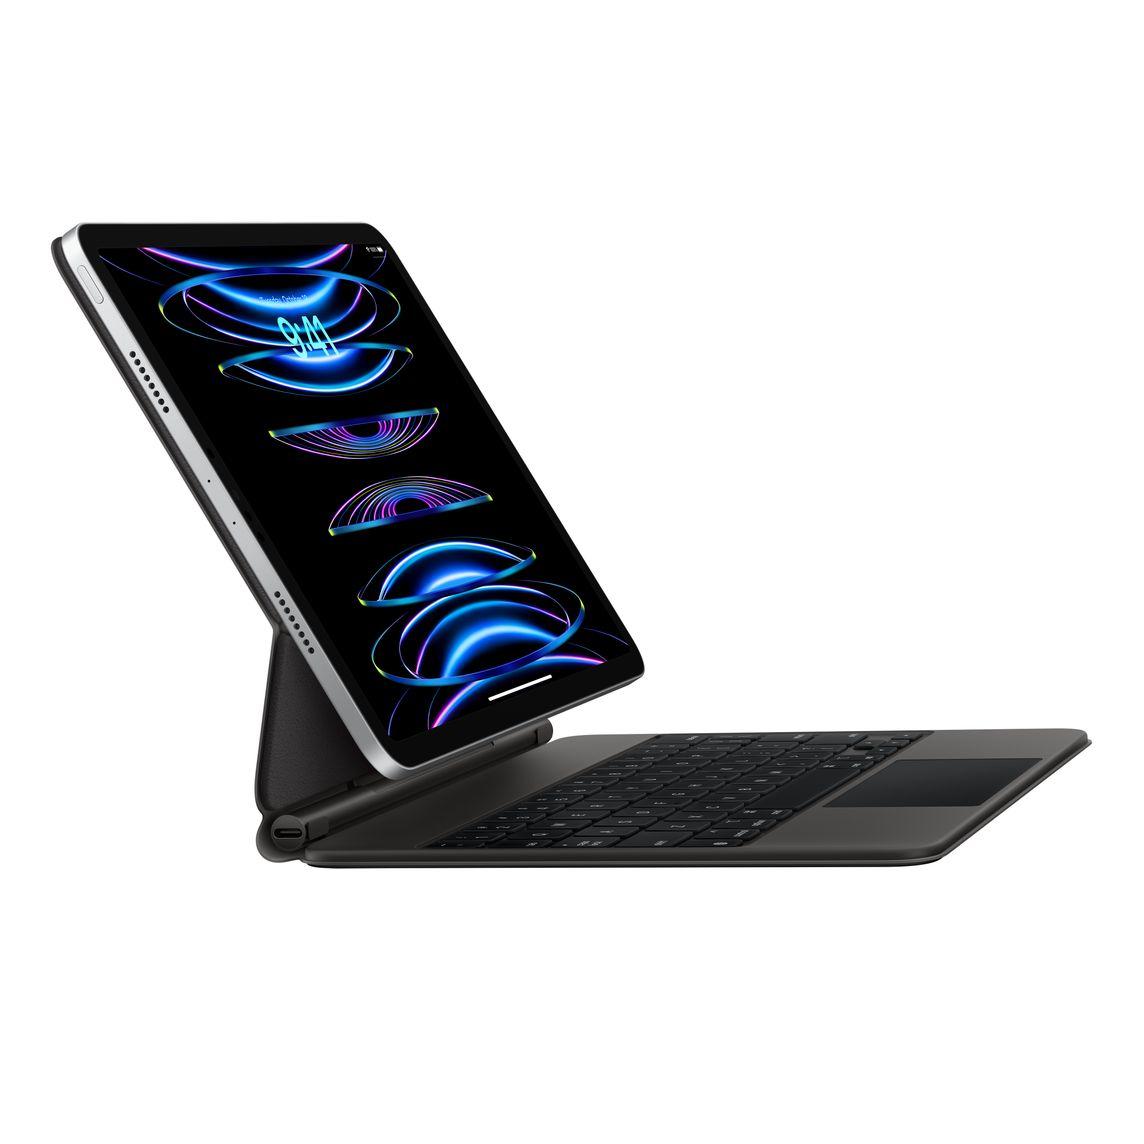 Magic Keyboard For Ipad Air 4th Generation And Ipad Pro 11 Inch 2nd Generation Us English Apple